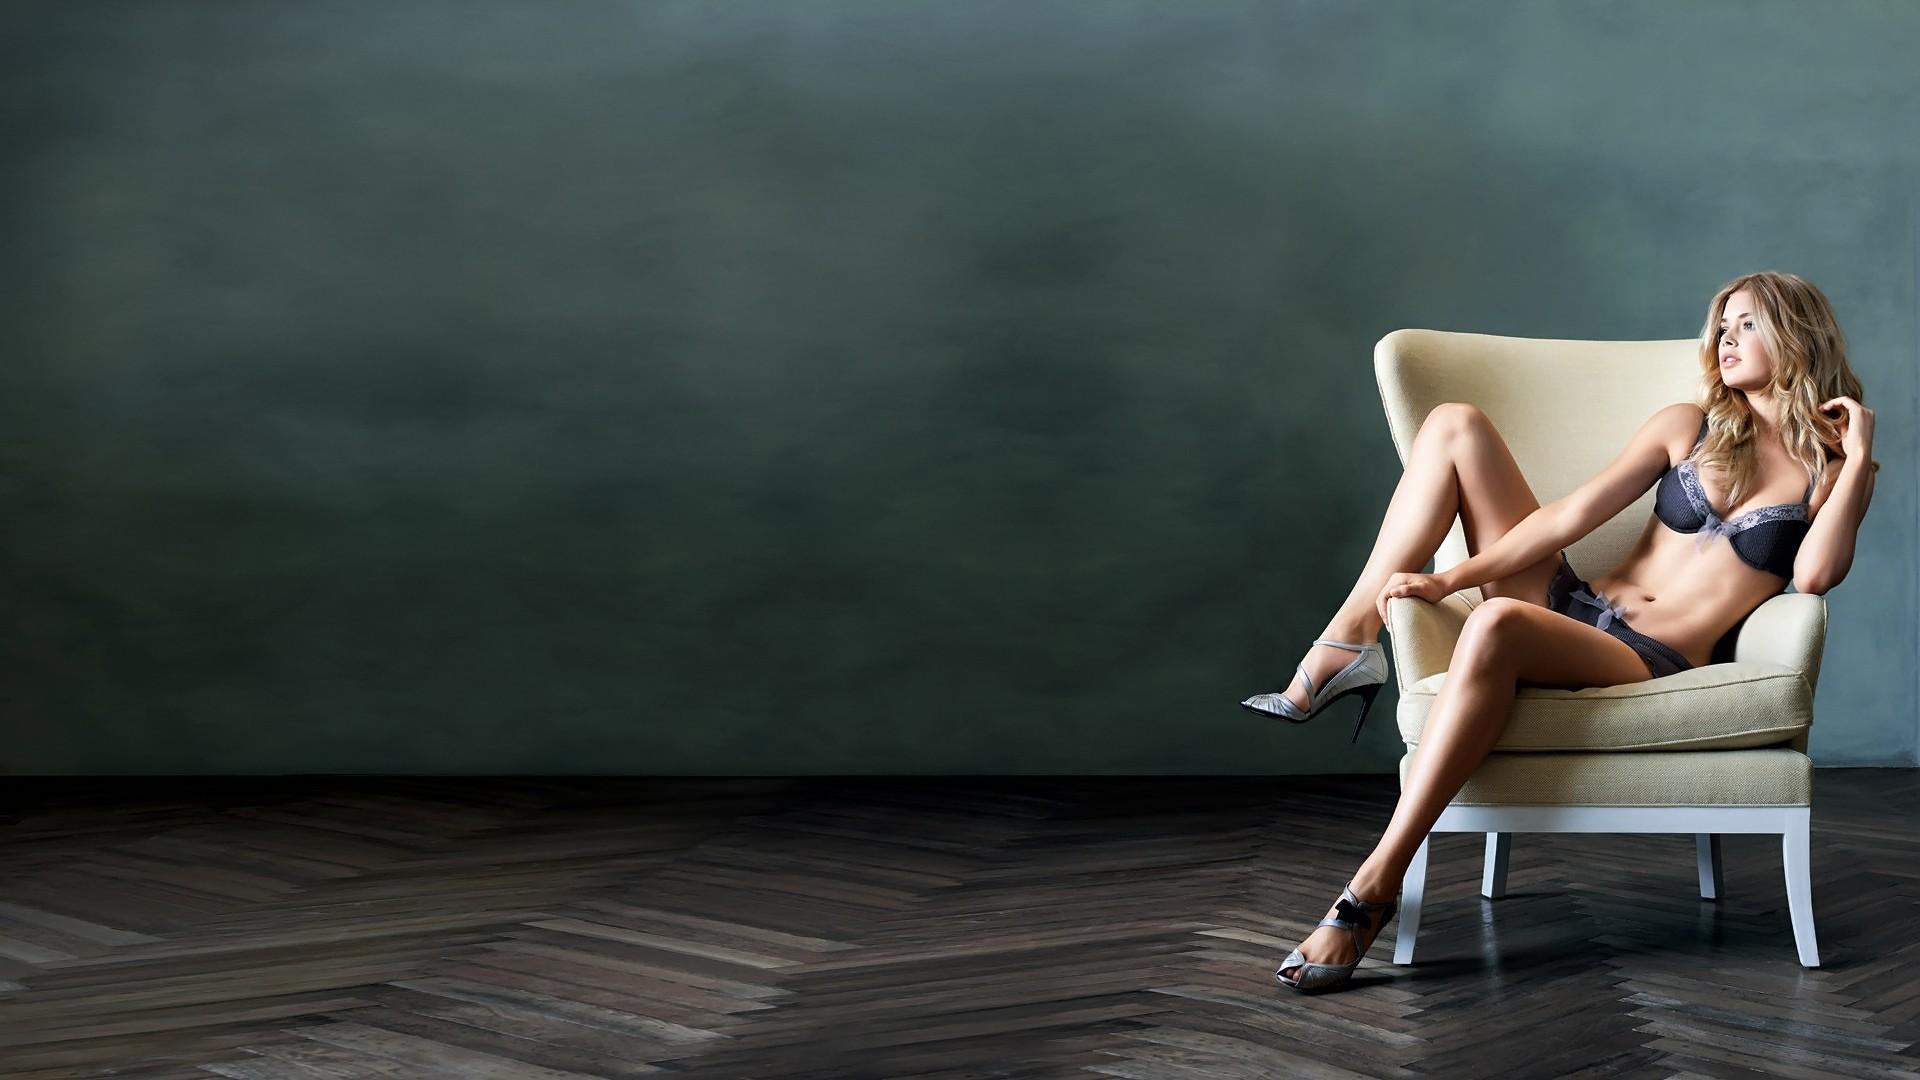 wallpaper : sports, women, blonde, sitting, photography, dress